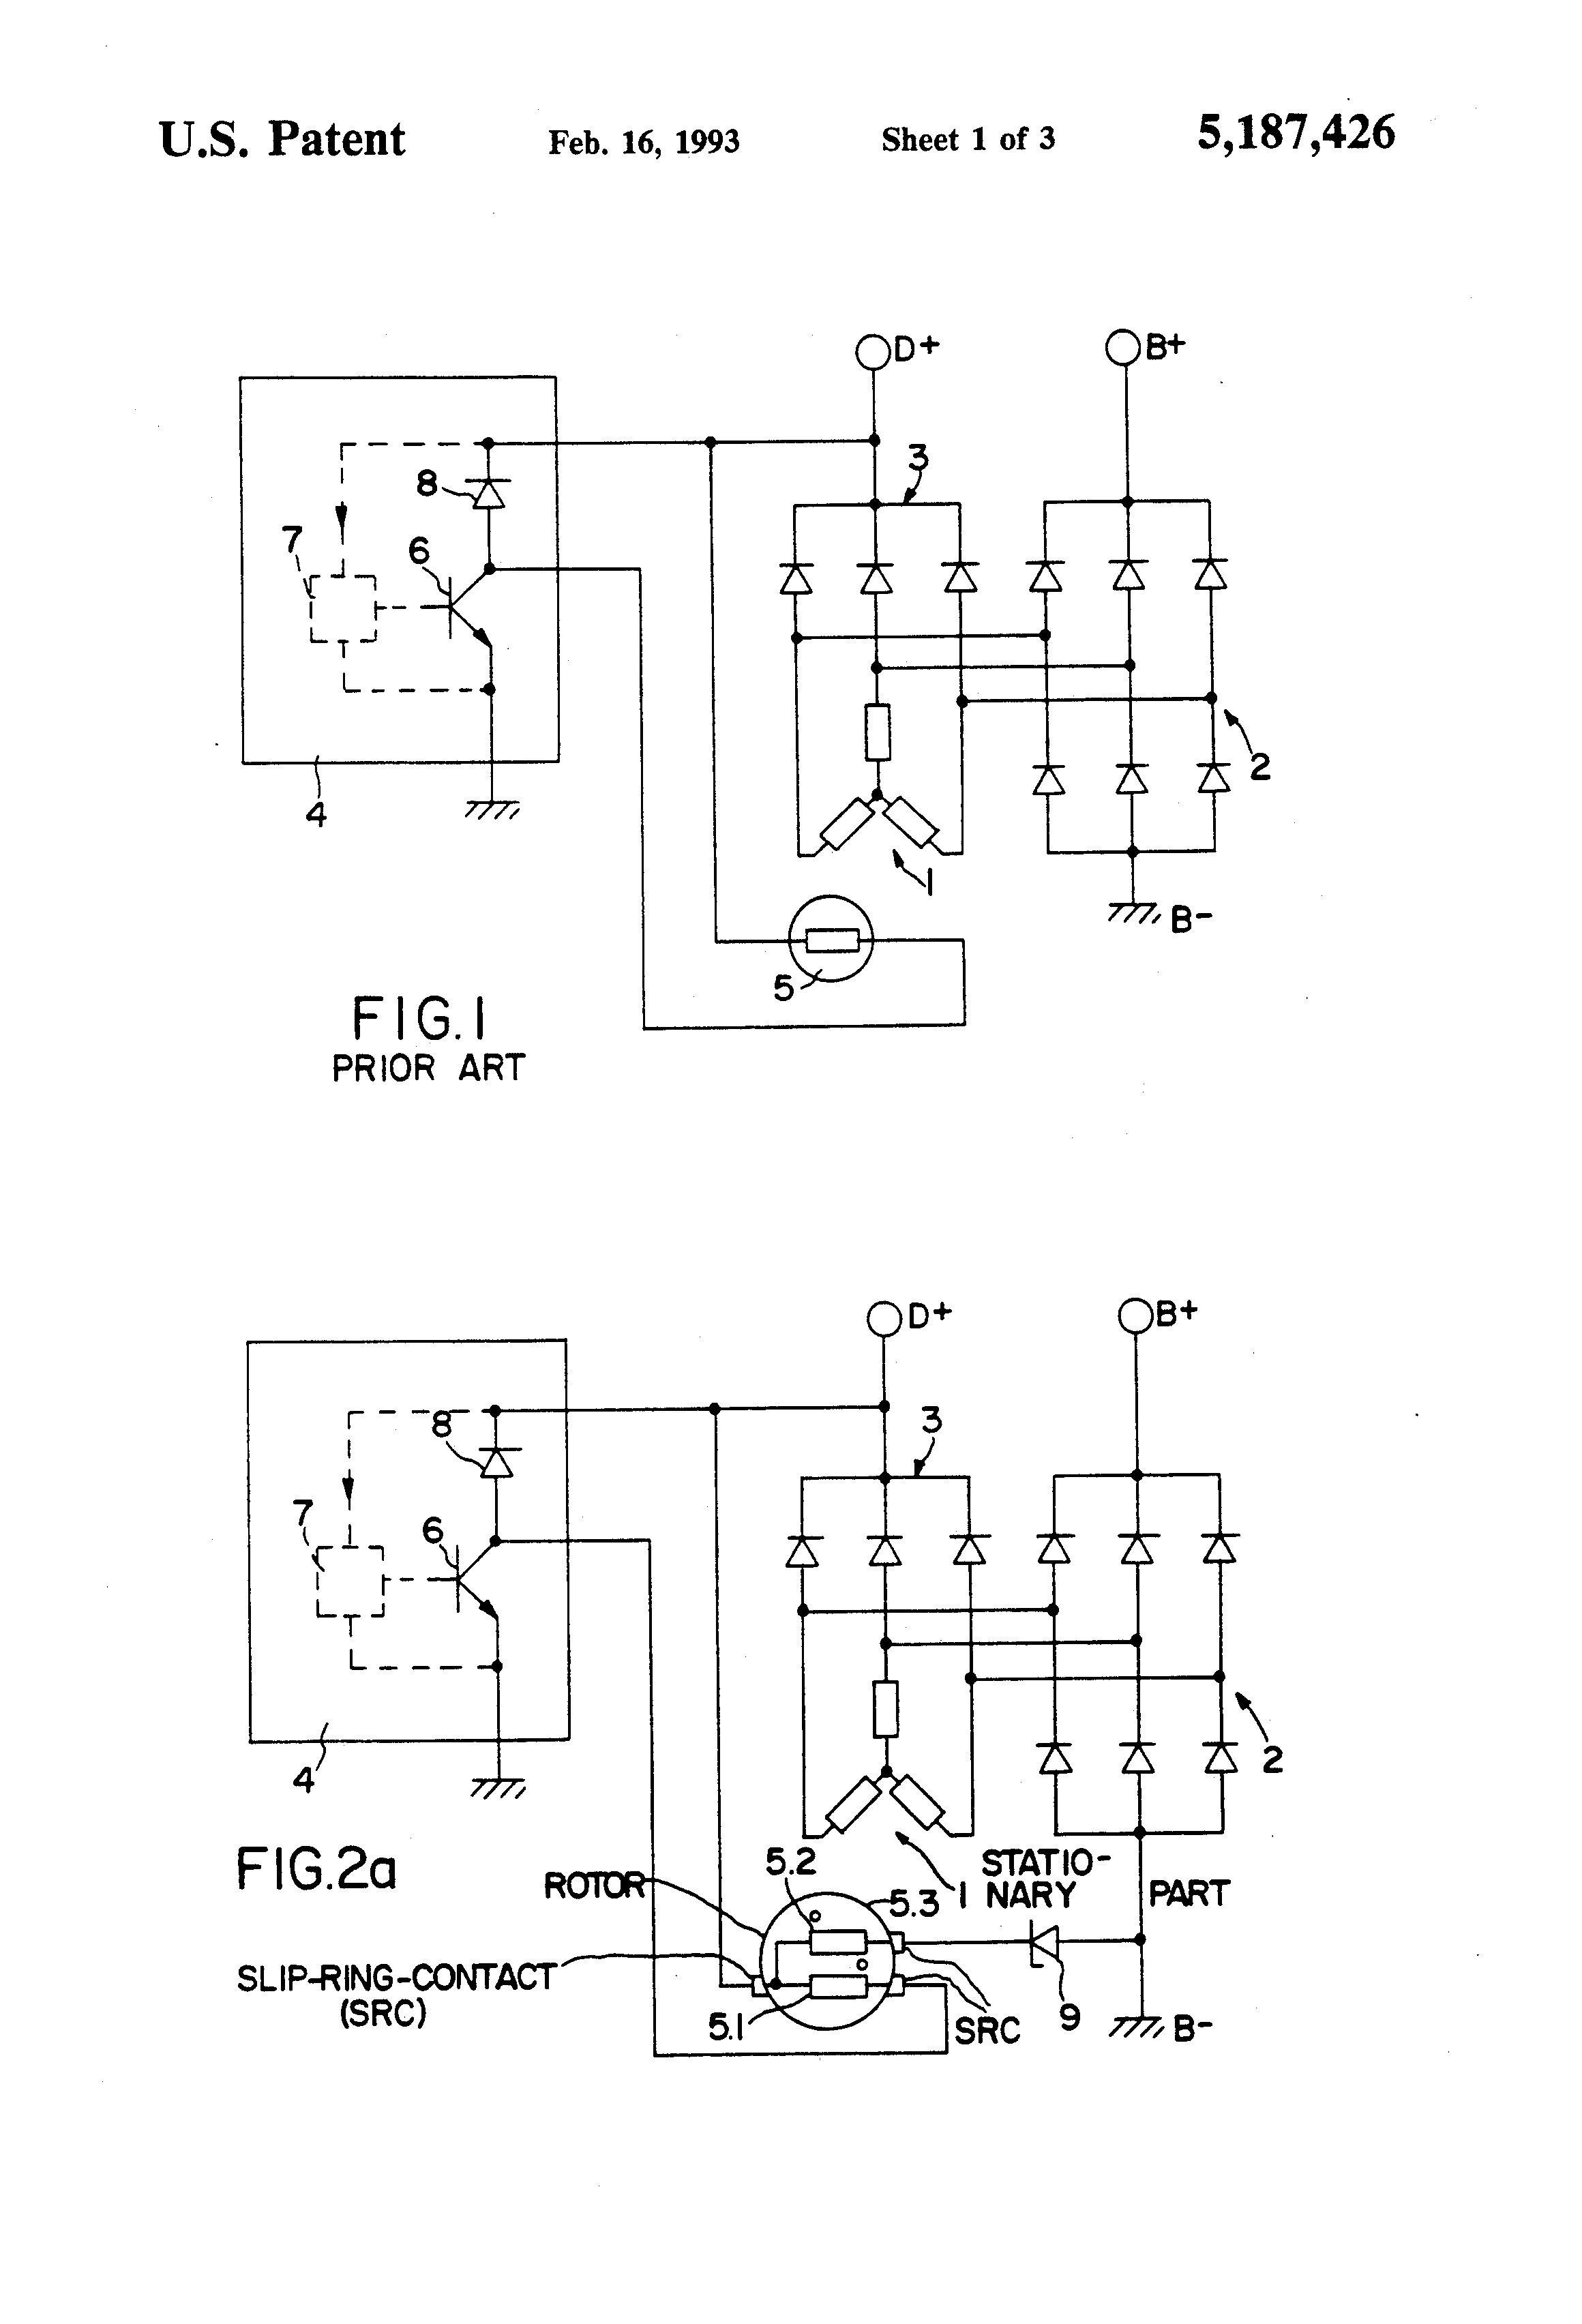 Single Wire Alternator Wiring Diagram Caterpillar Alternator Wiring Diagram Opinions About Wiring Diagram • Of Single Wire Alternator Wiring Diagram